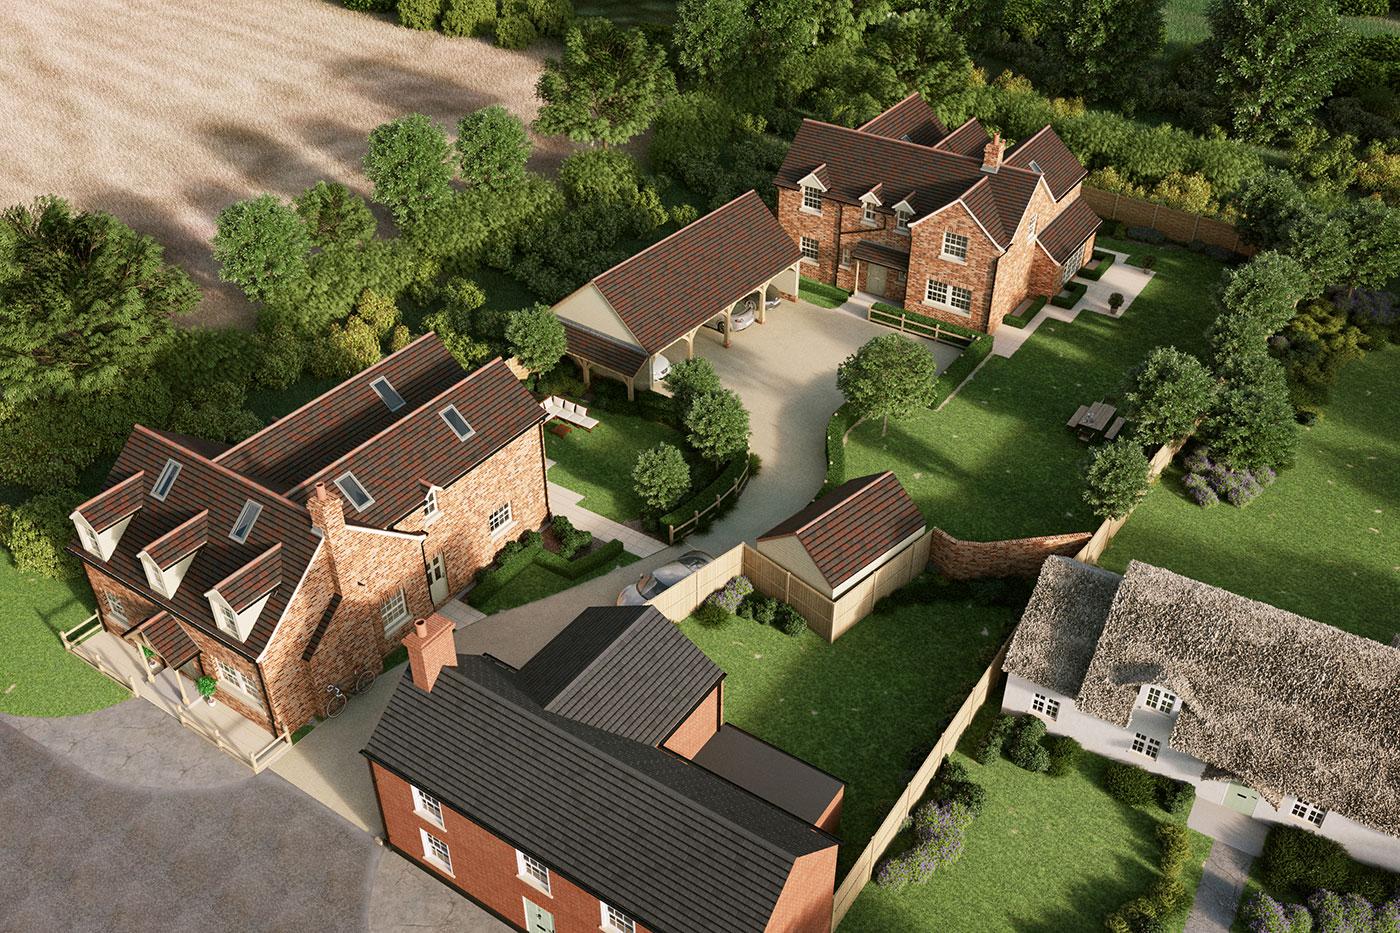 Potton_Road_Aerial_Final-3D-Property-Market